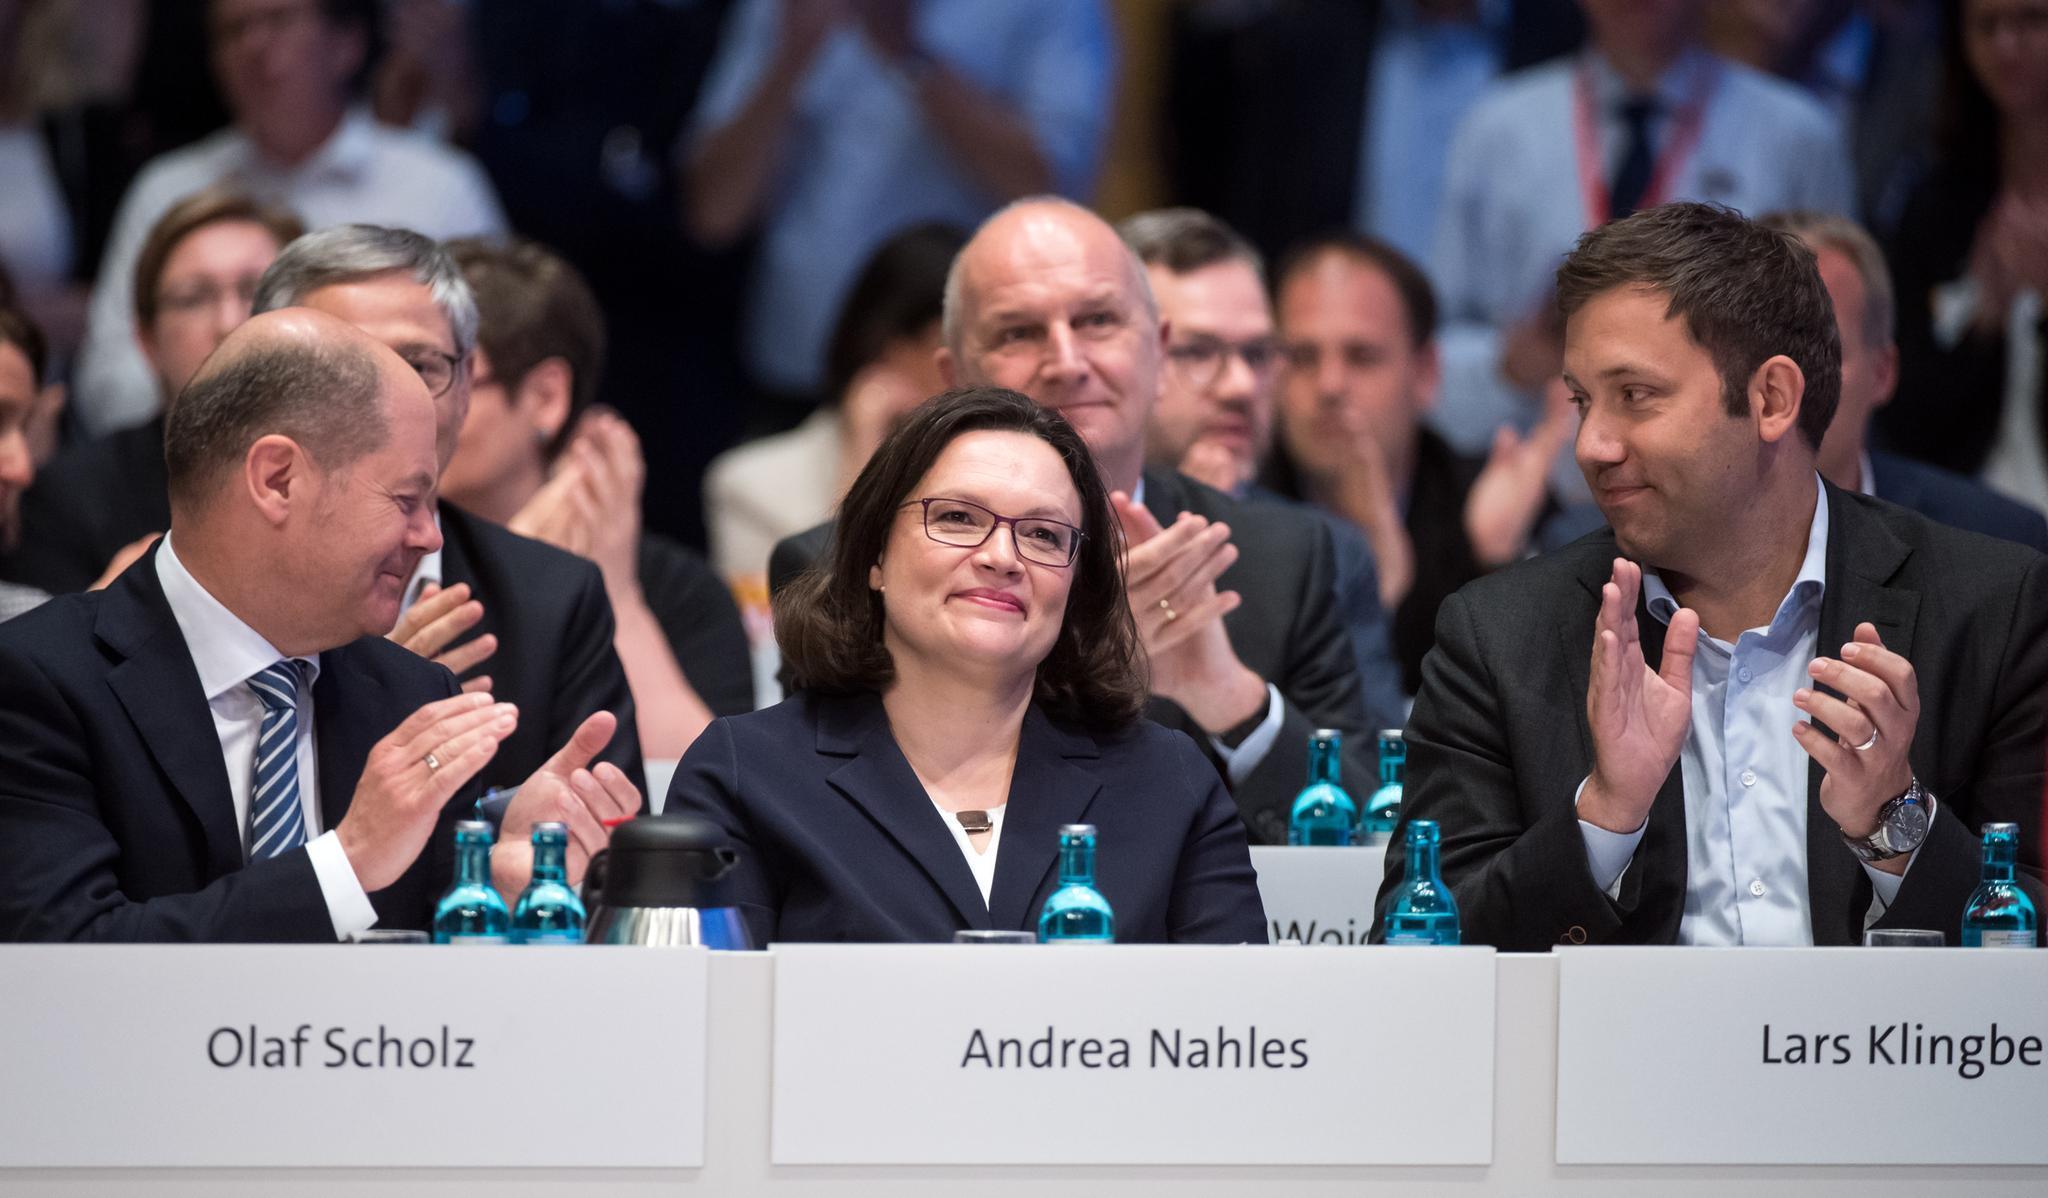 Andrea Nahles Kassiert Ohrfeige Pressestimmen Zur Neuen SPD